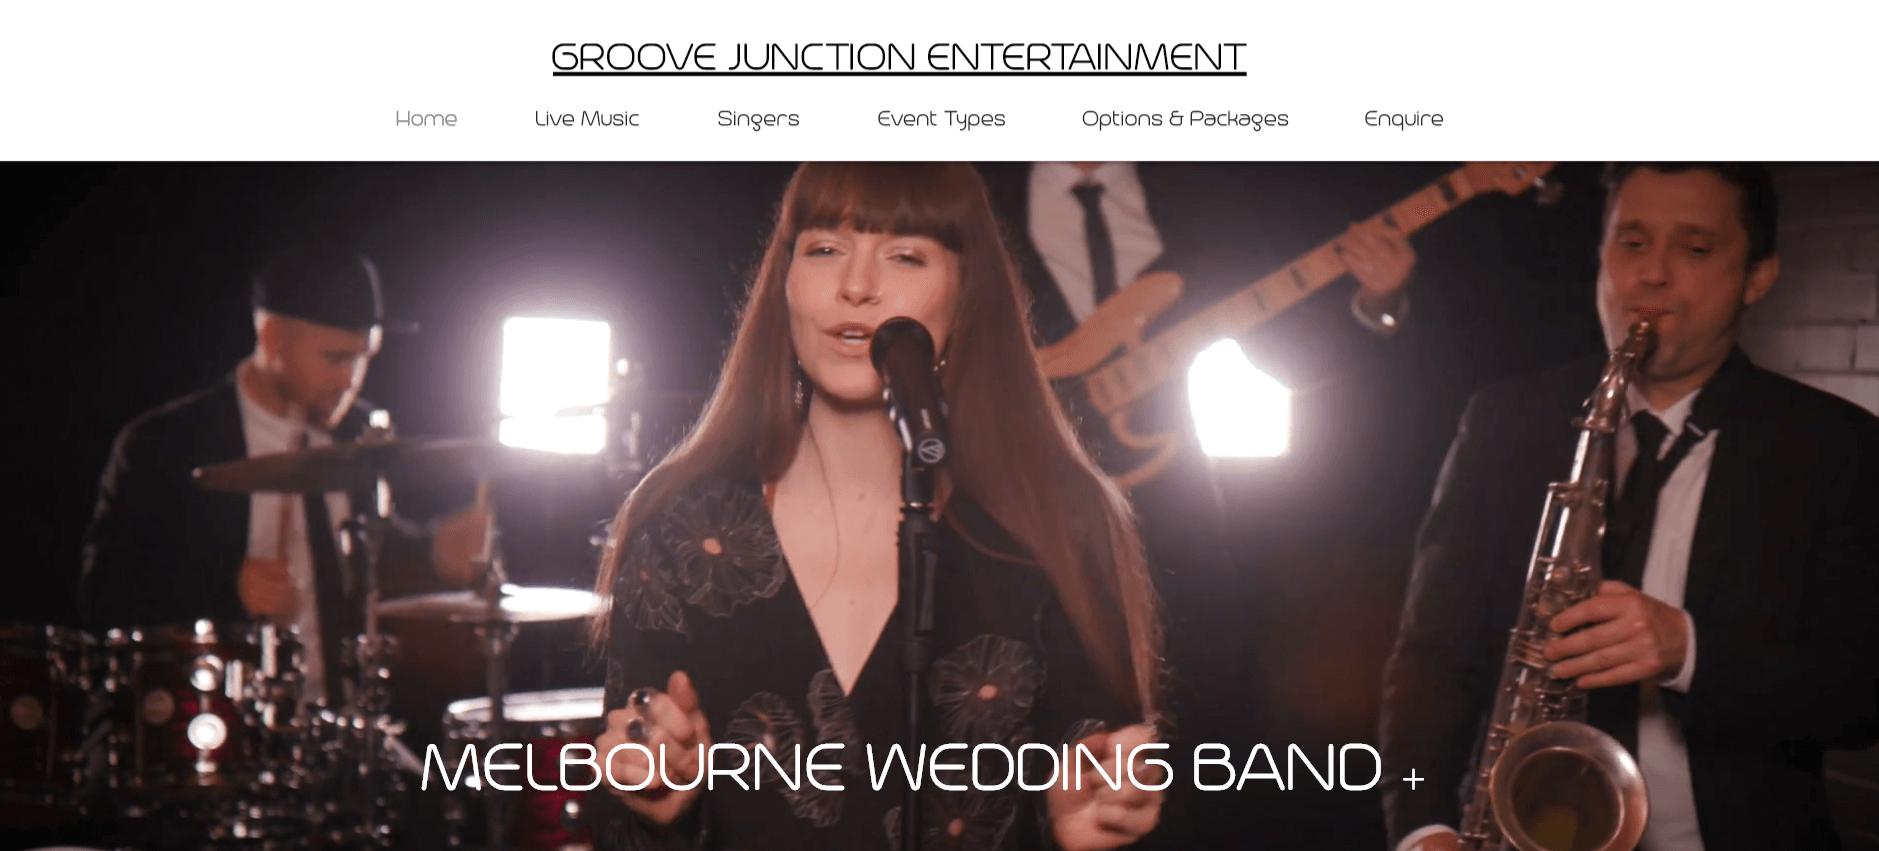 Top 30 Wedding Bands, Singers & Musicians Melbourne [2021]